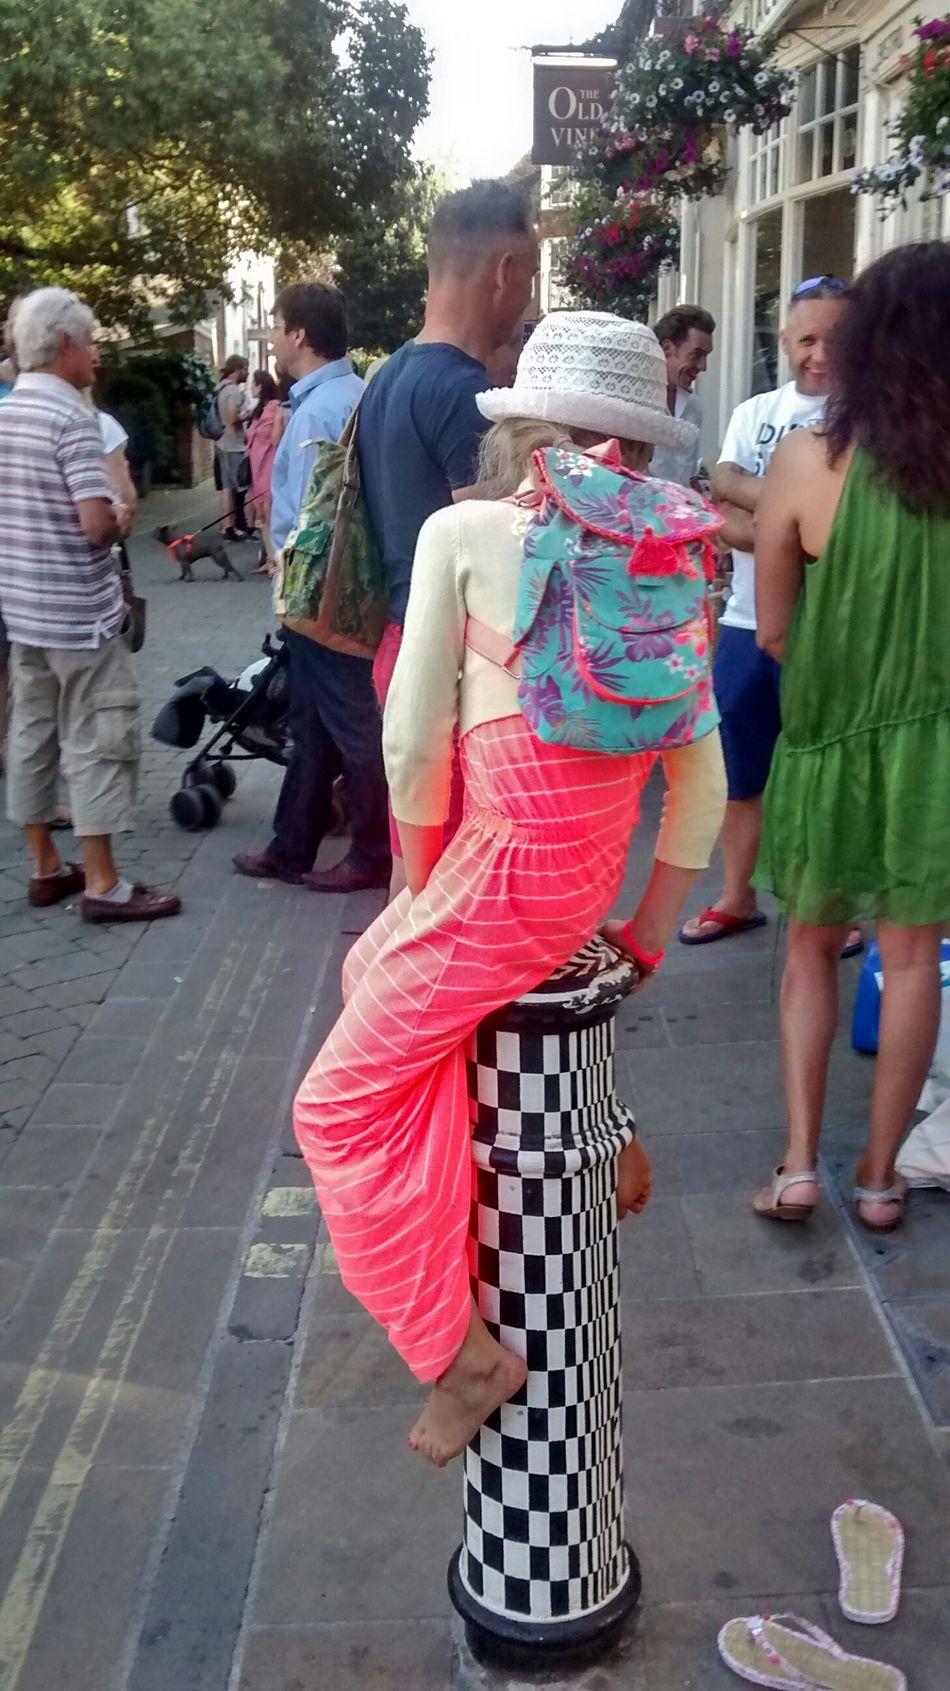 The Purist (no Edit, No Filter) Streetphotography Street Art Natural Coloursplash Hat Fair